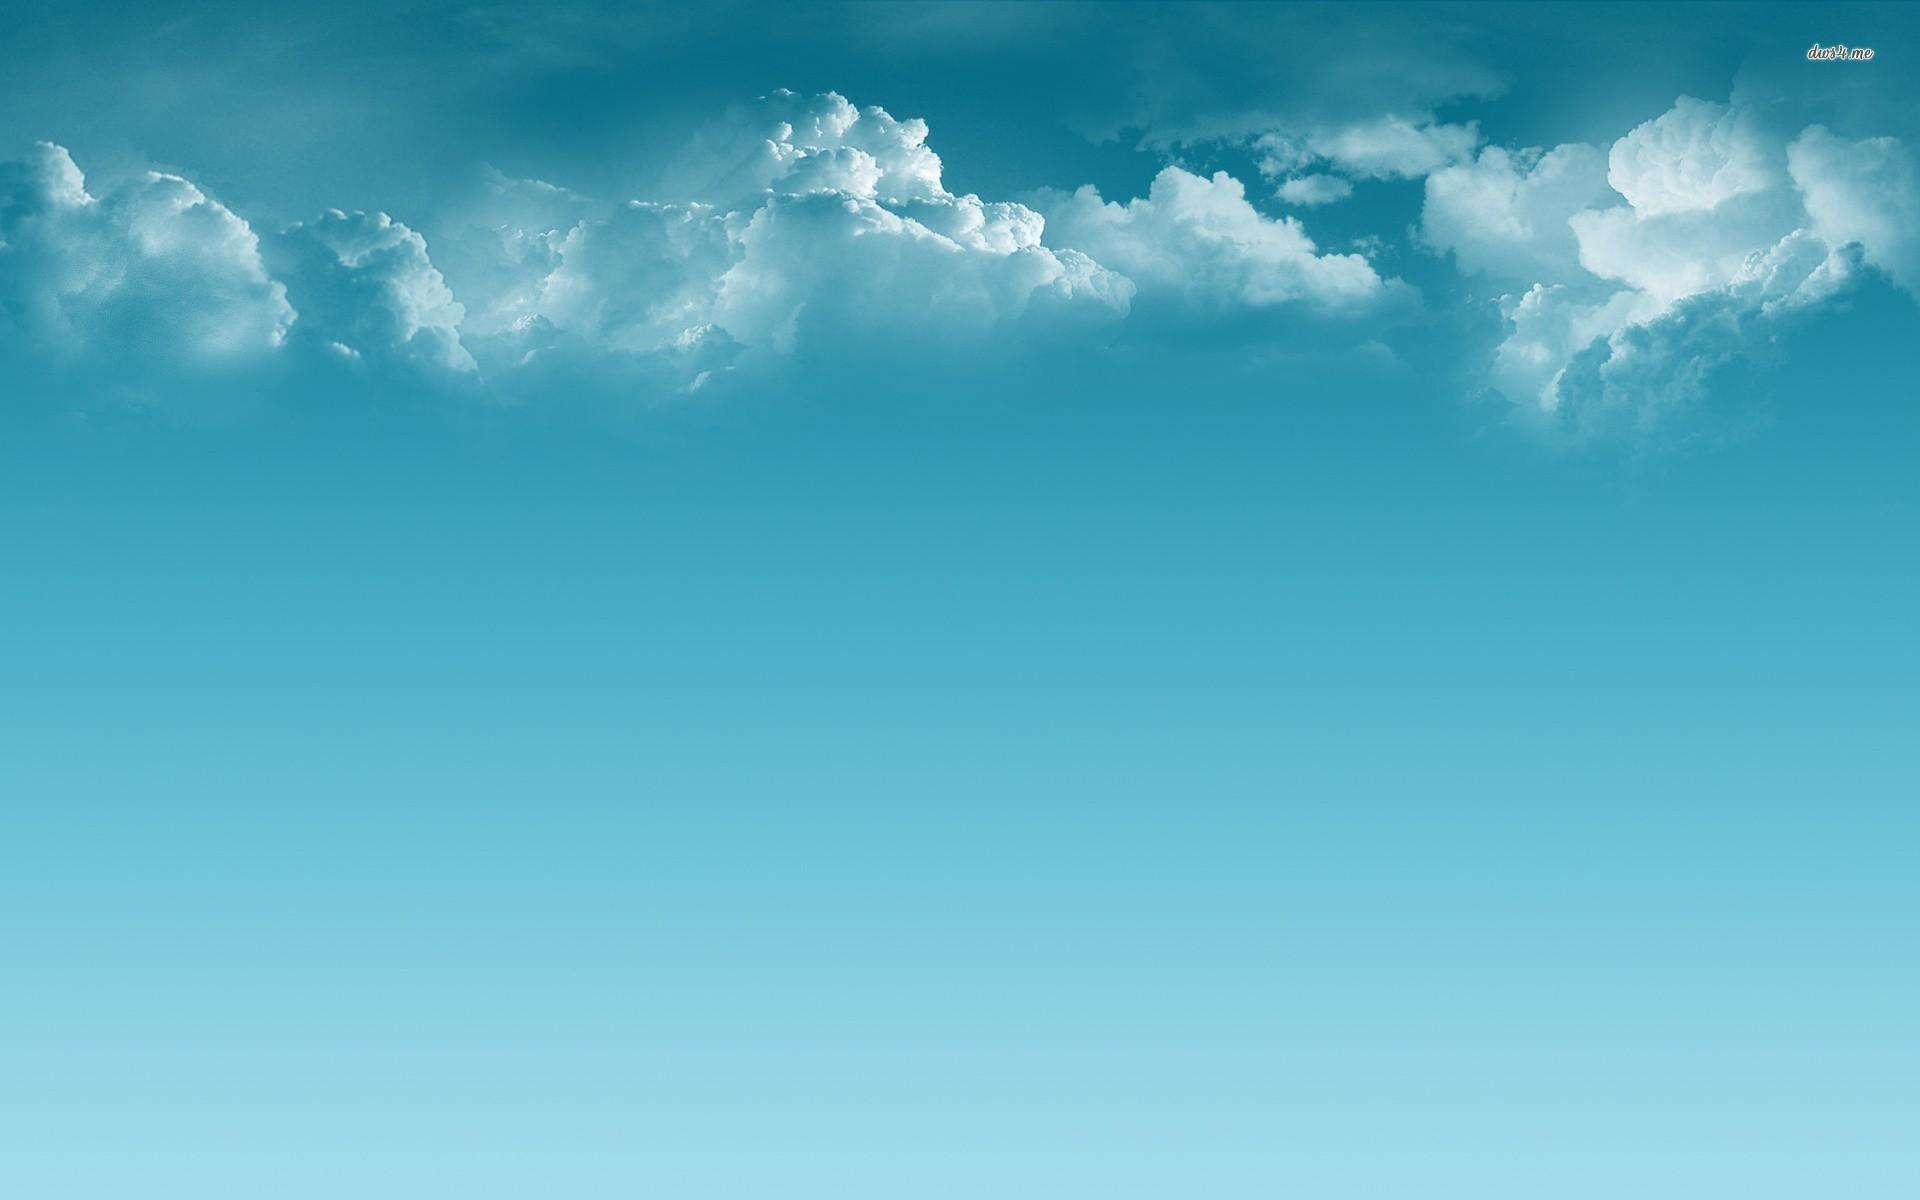 clouds-and-blue-sky-1920×1200-digital-art-wallpaper